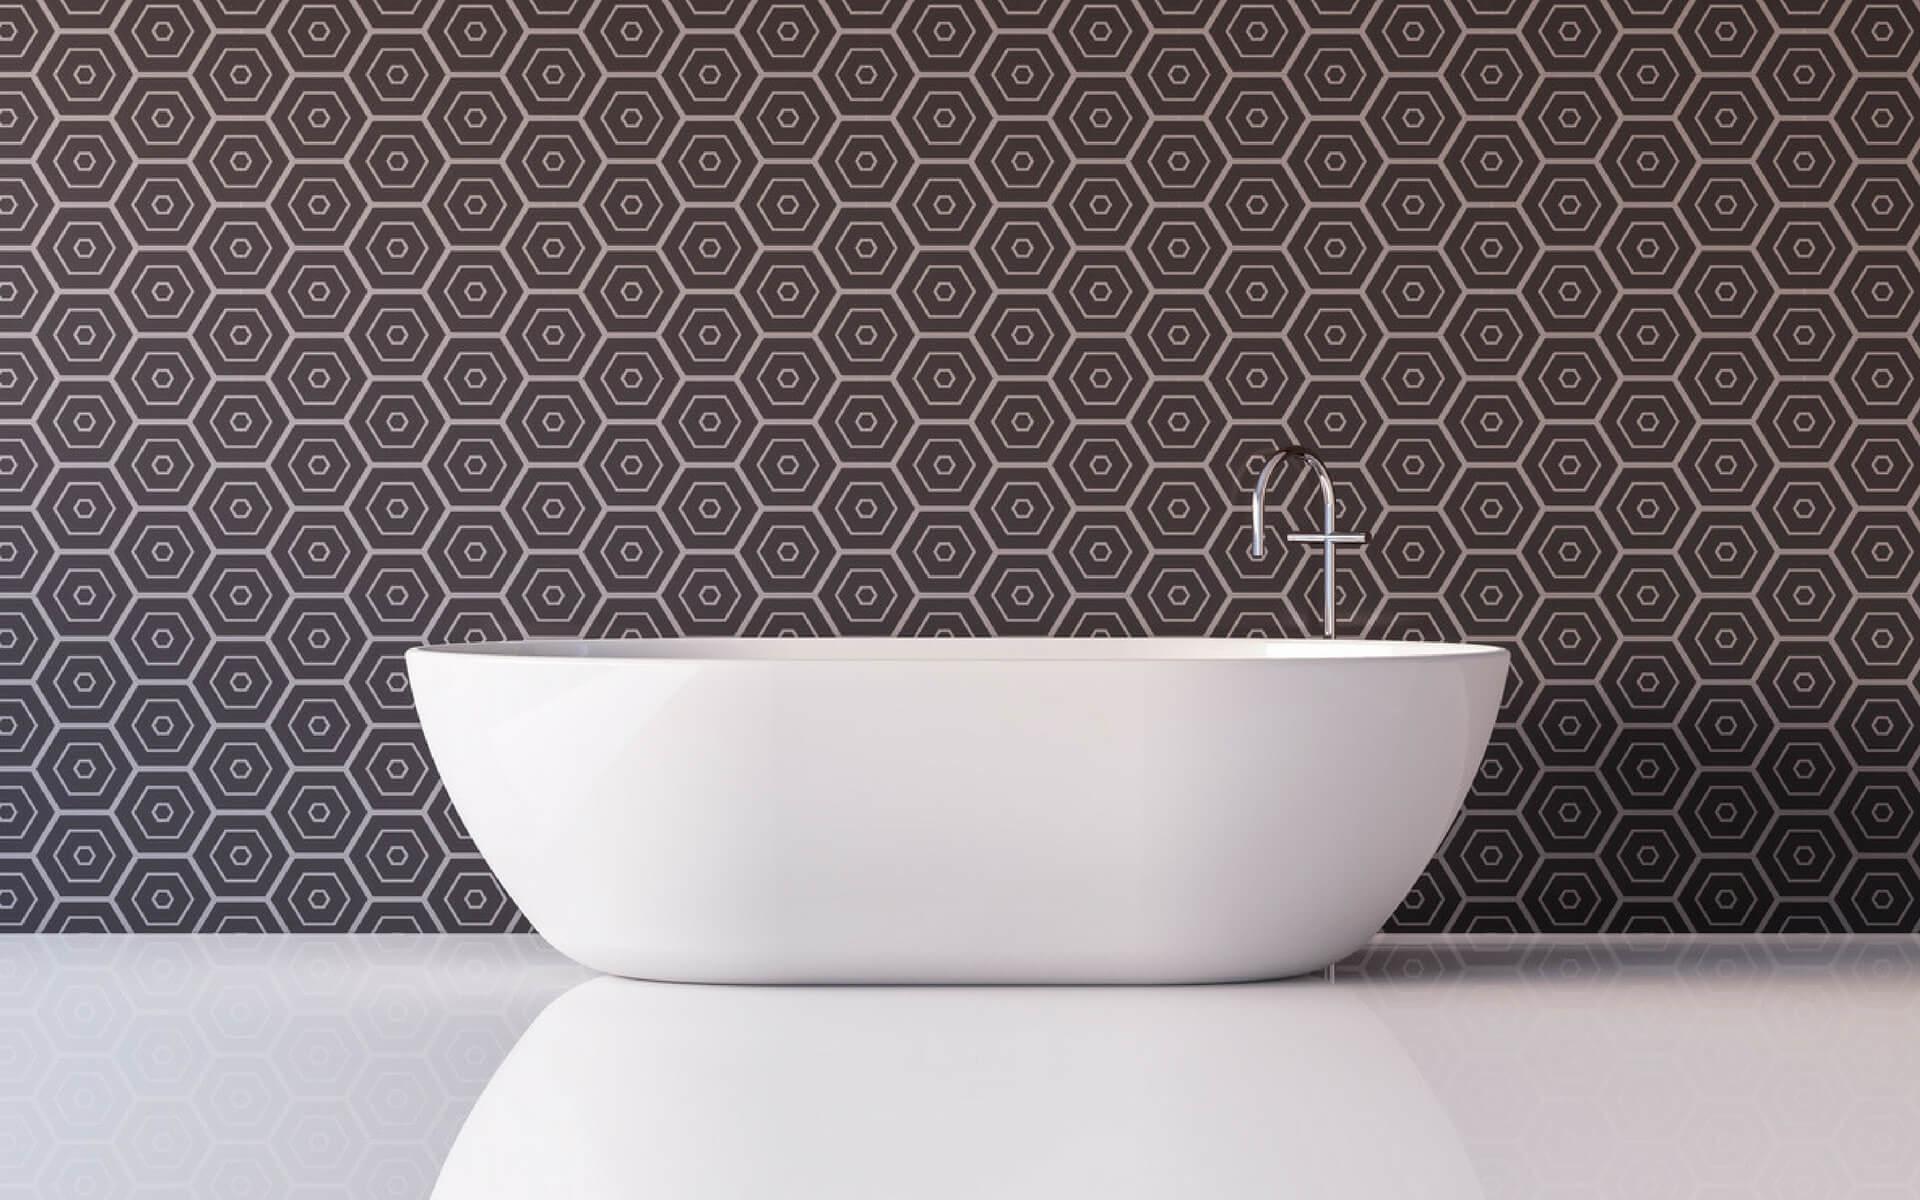 Carta da parati per rinnovare il bagno blog oknoplast